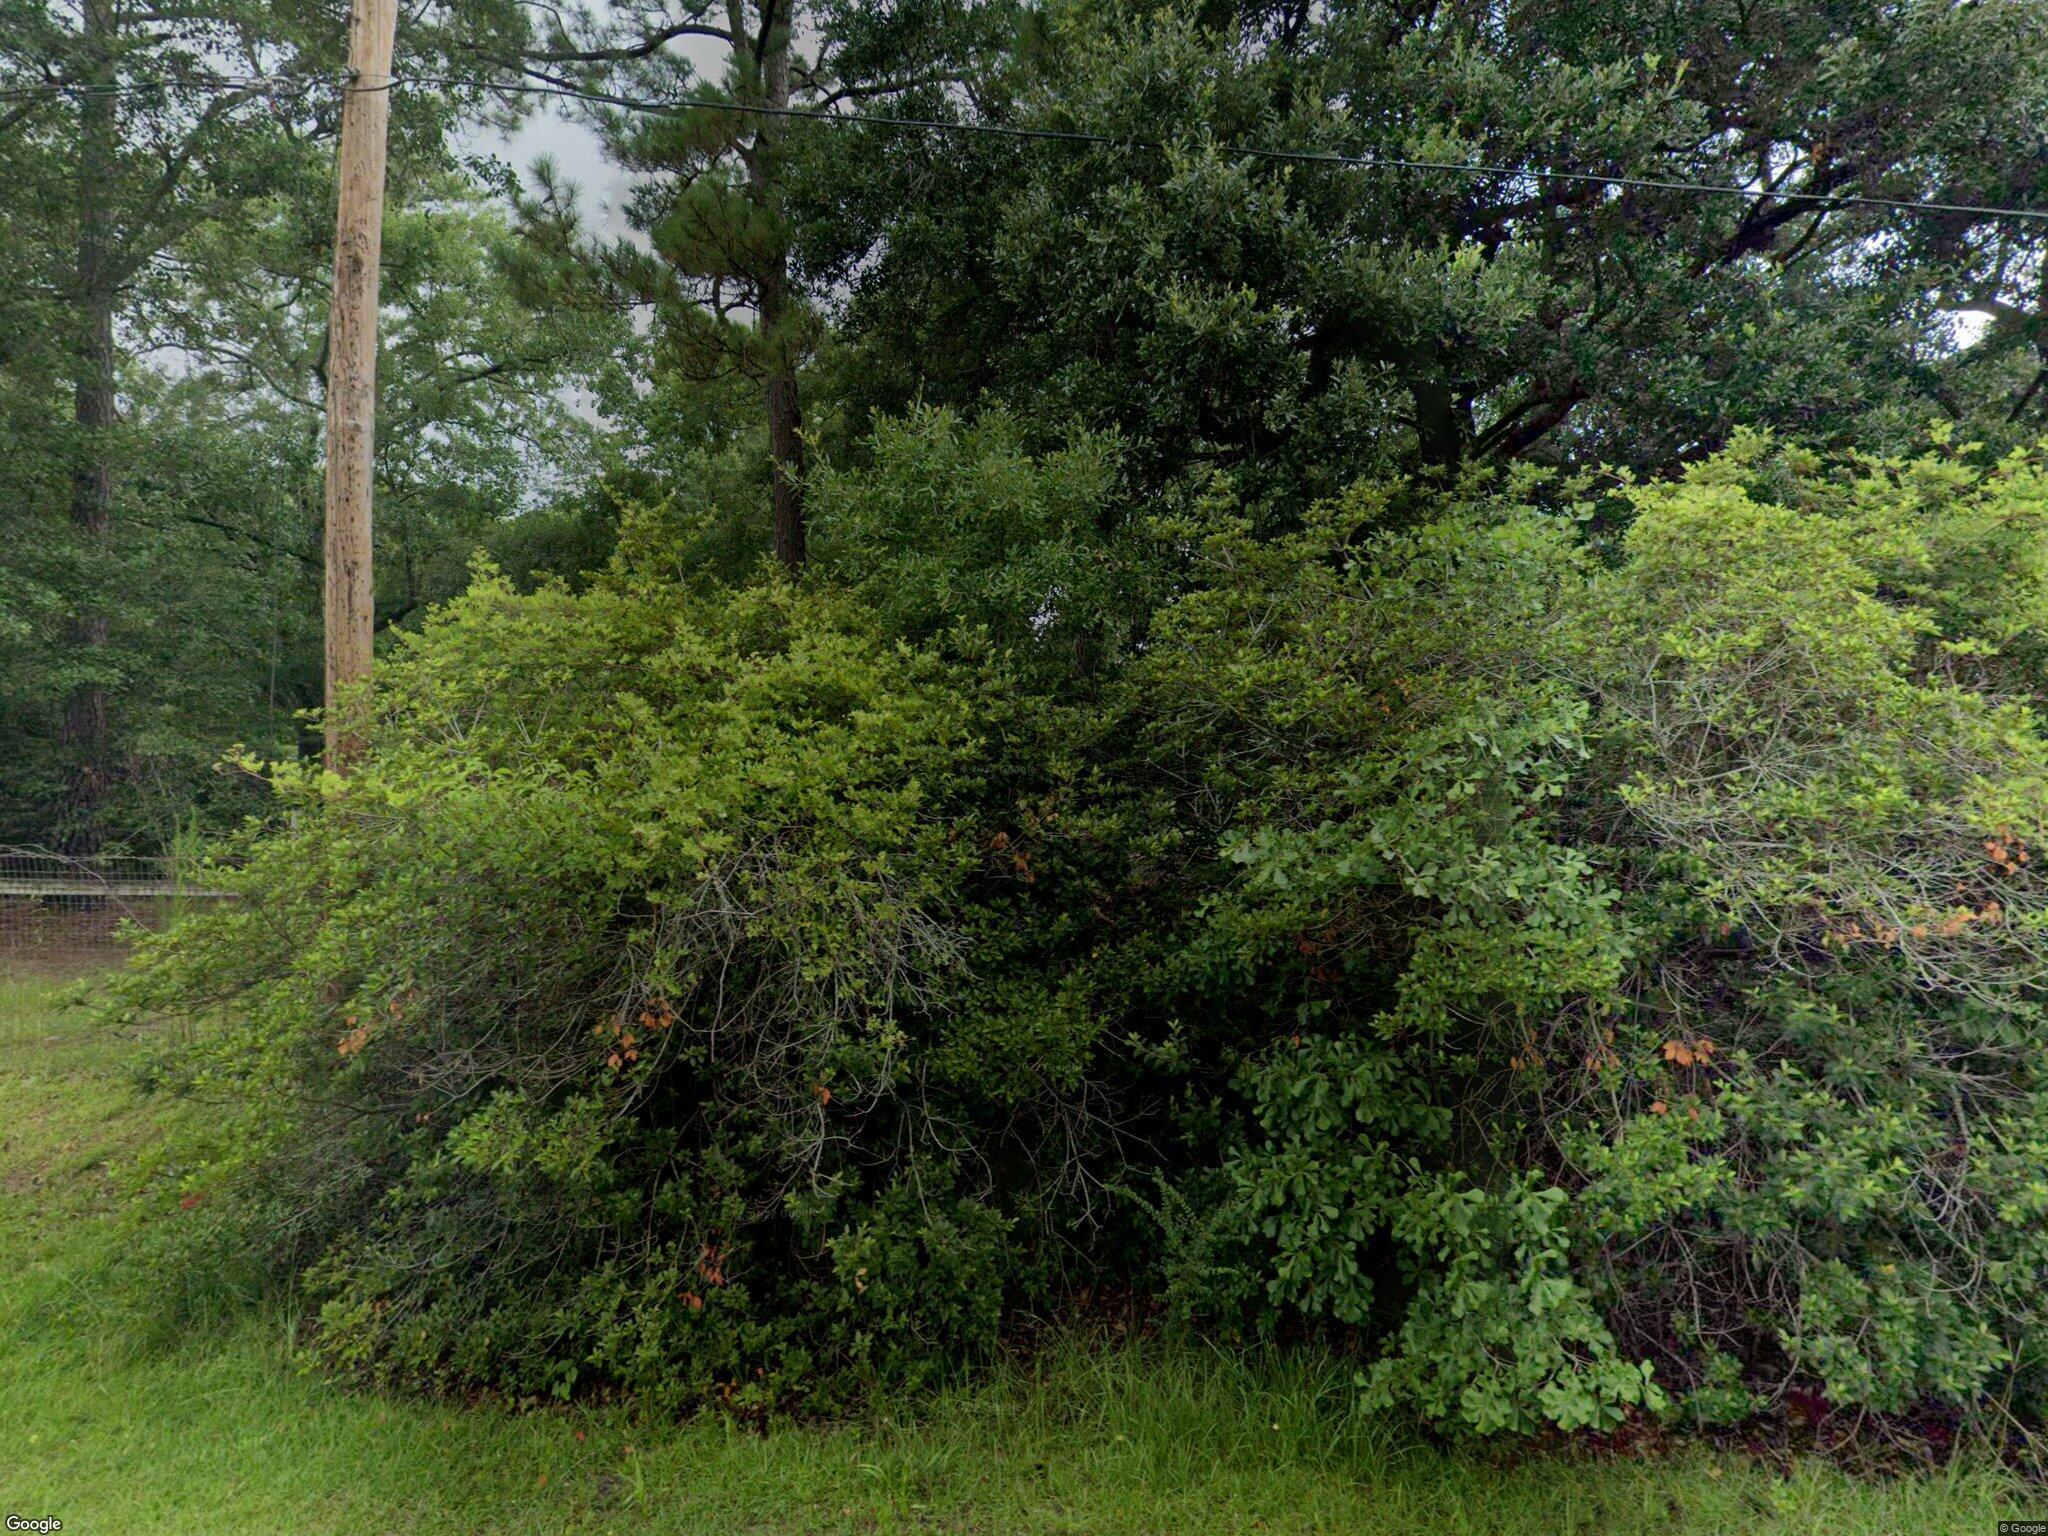 232 Hillcrest Dr, Moncks Corner, SC 29461 - Foreclosure   Trulia